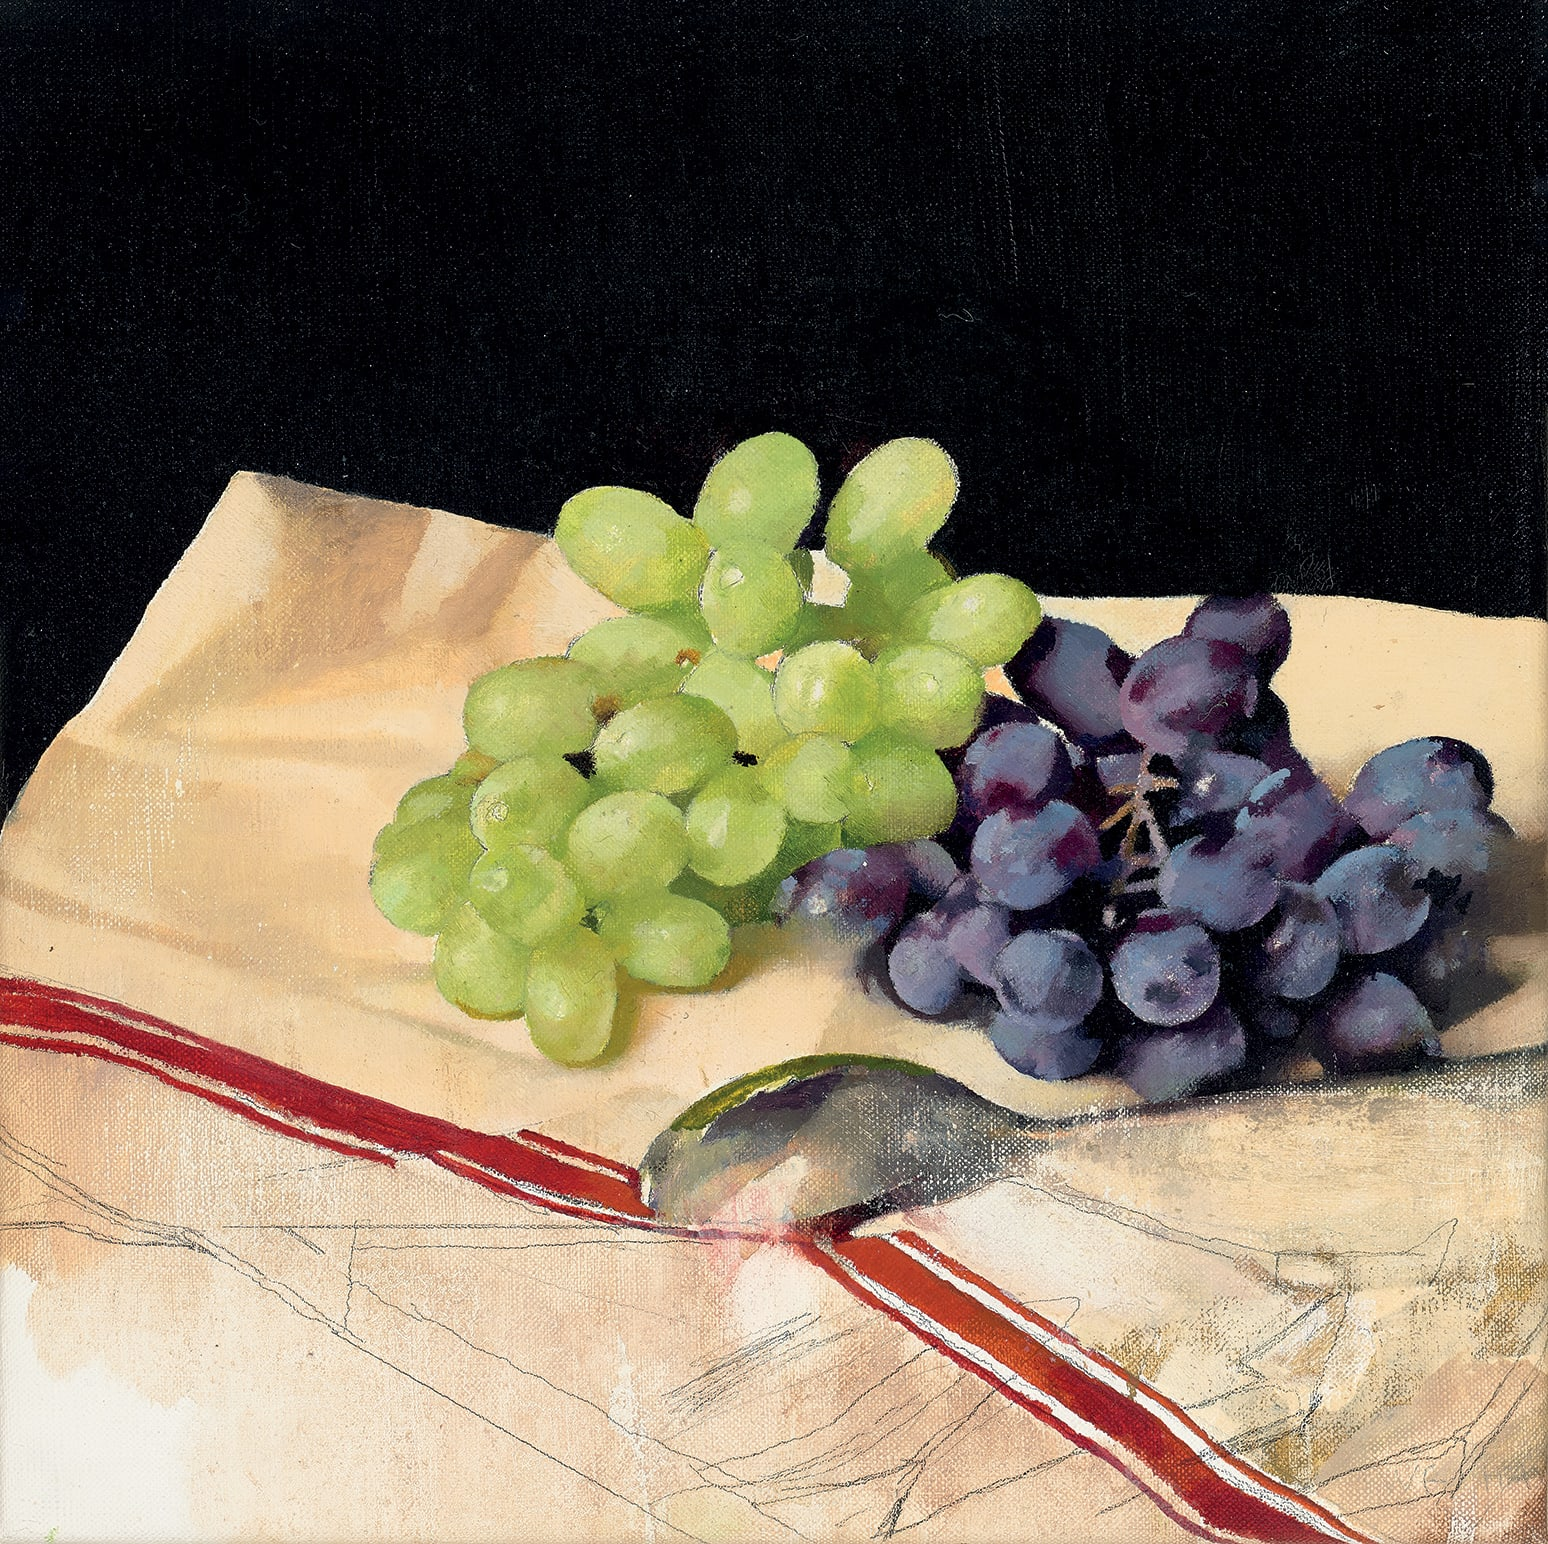 Diarmuid Kelley, Untitled (Grapes), 2016